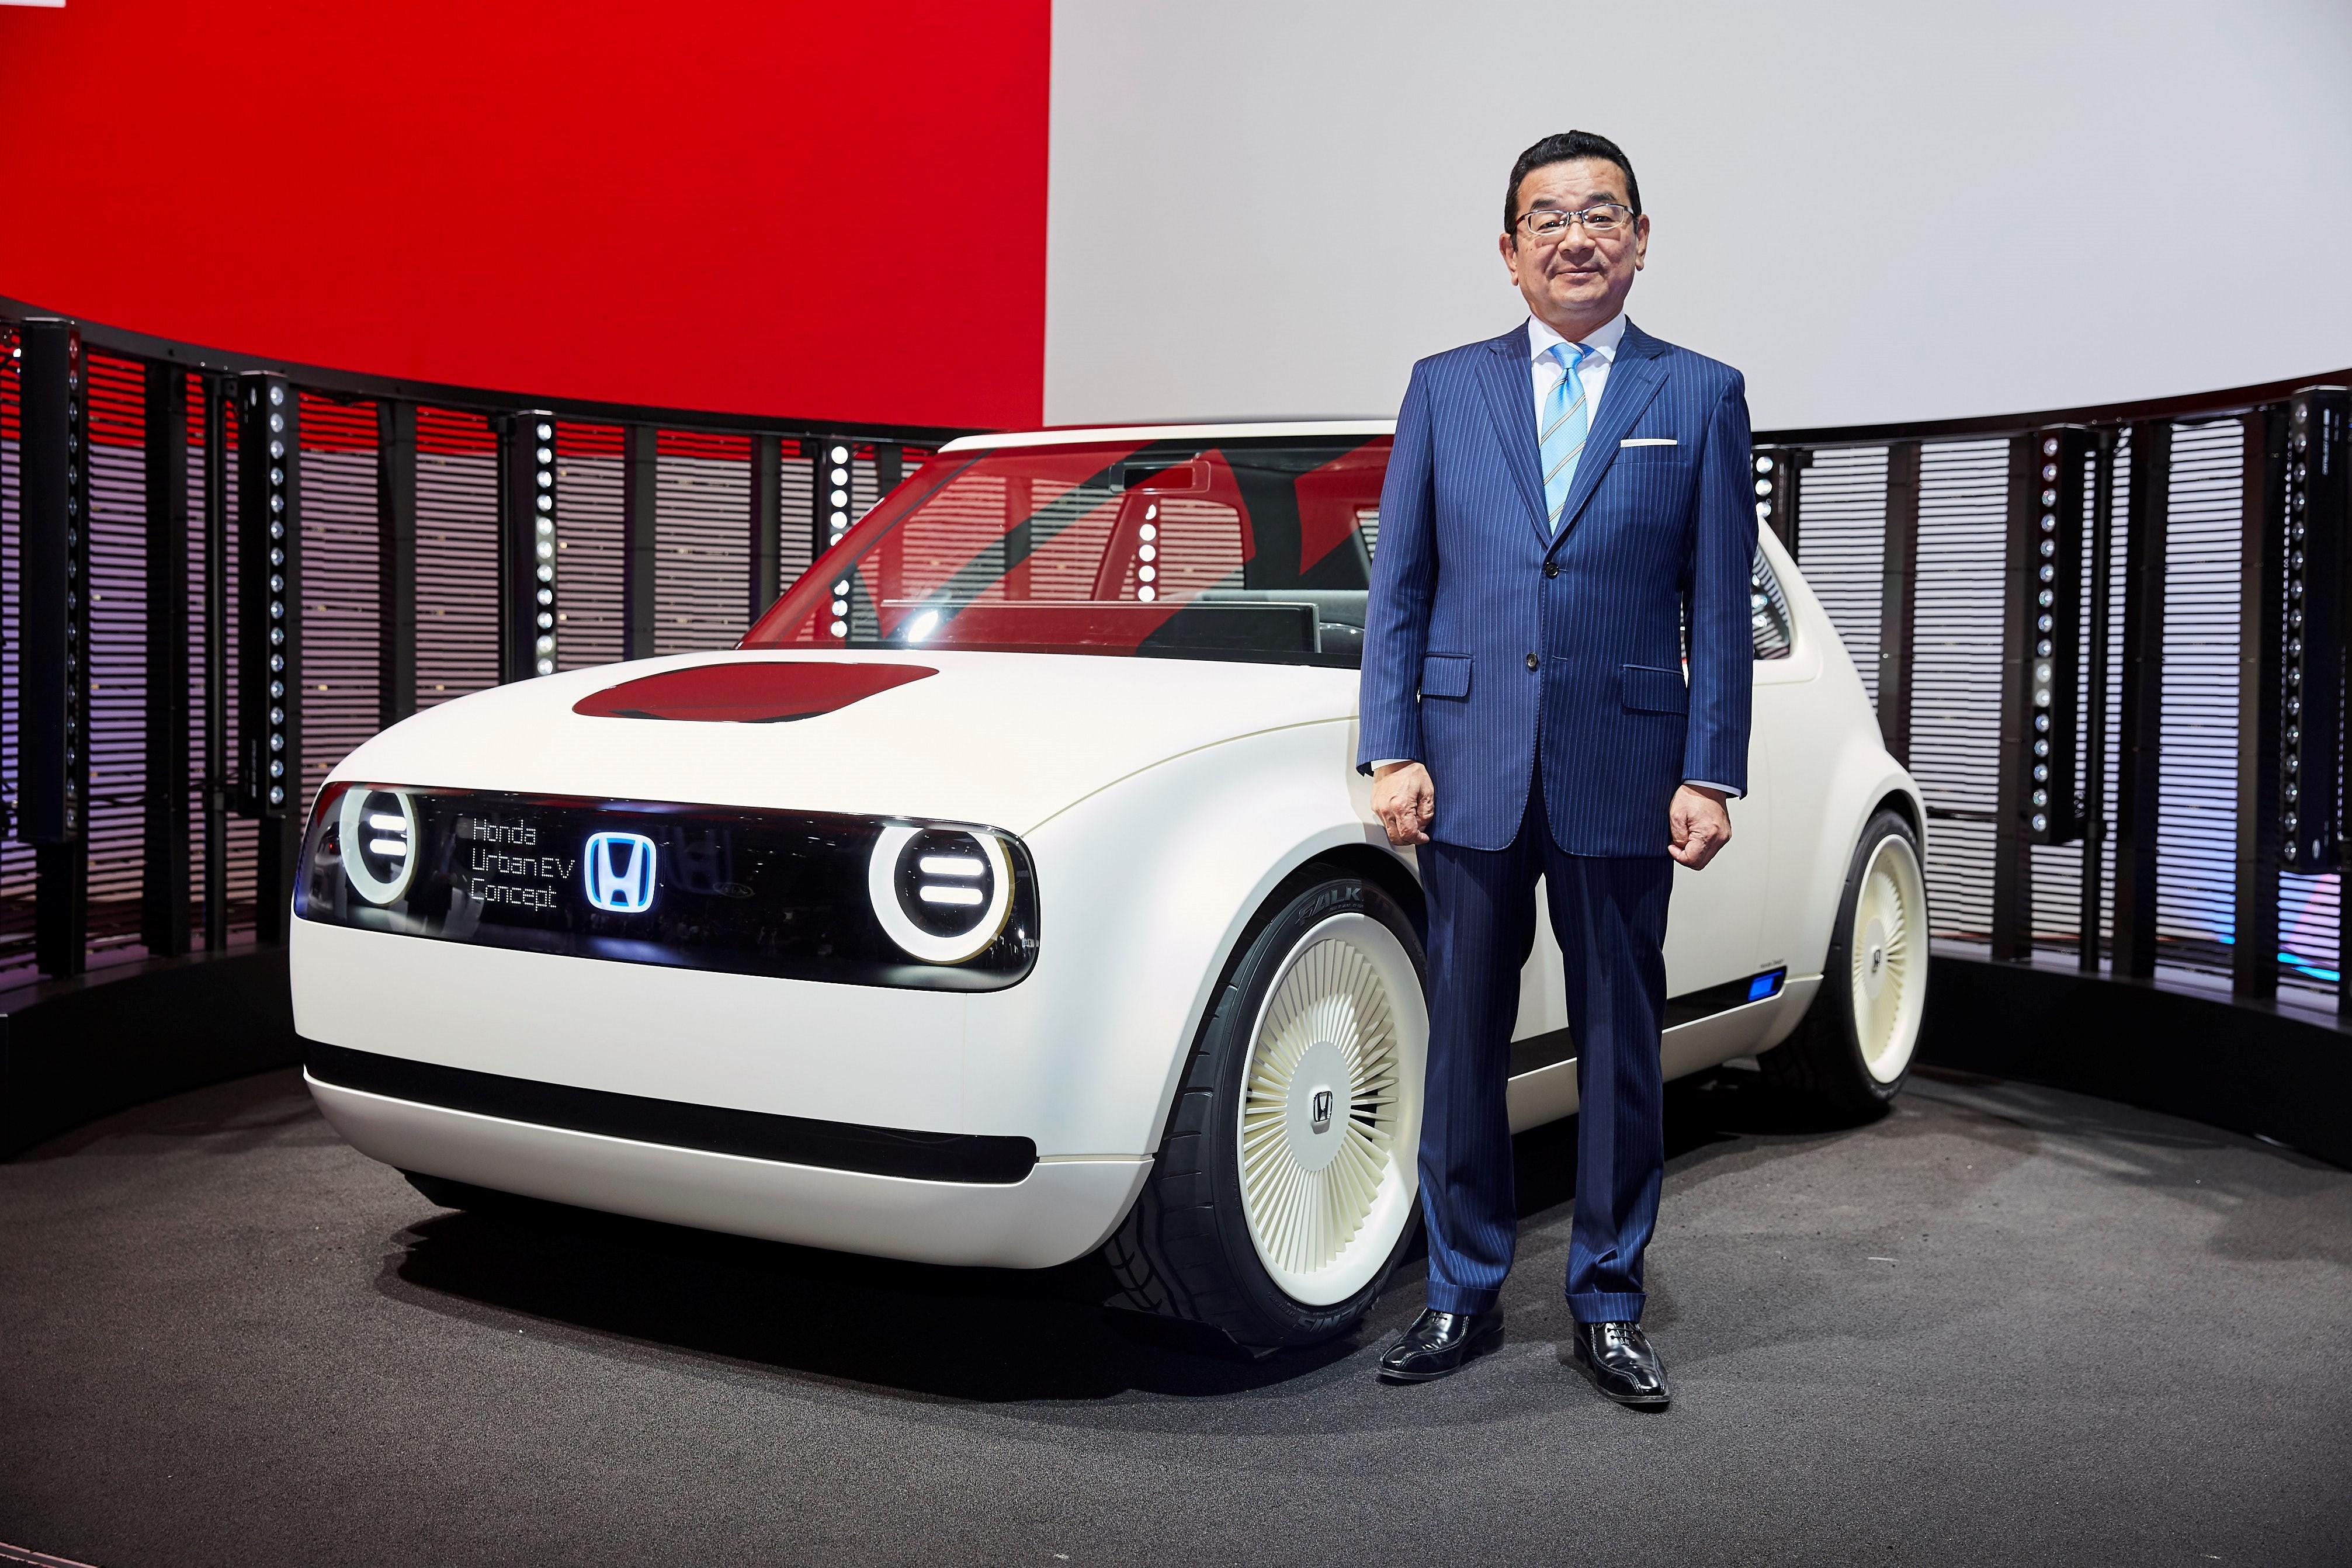 Hachigo is shown standing next to Honda's Urban EV Concept, a white battery-powered hatchback.